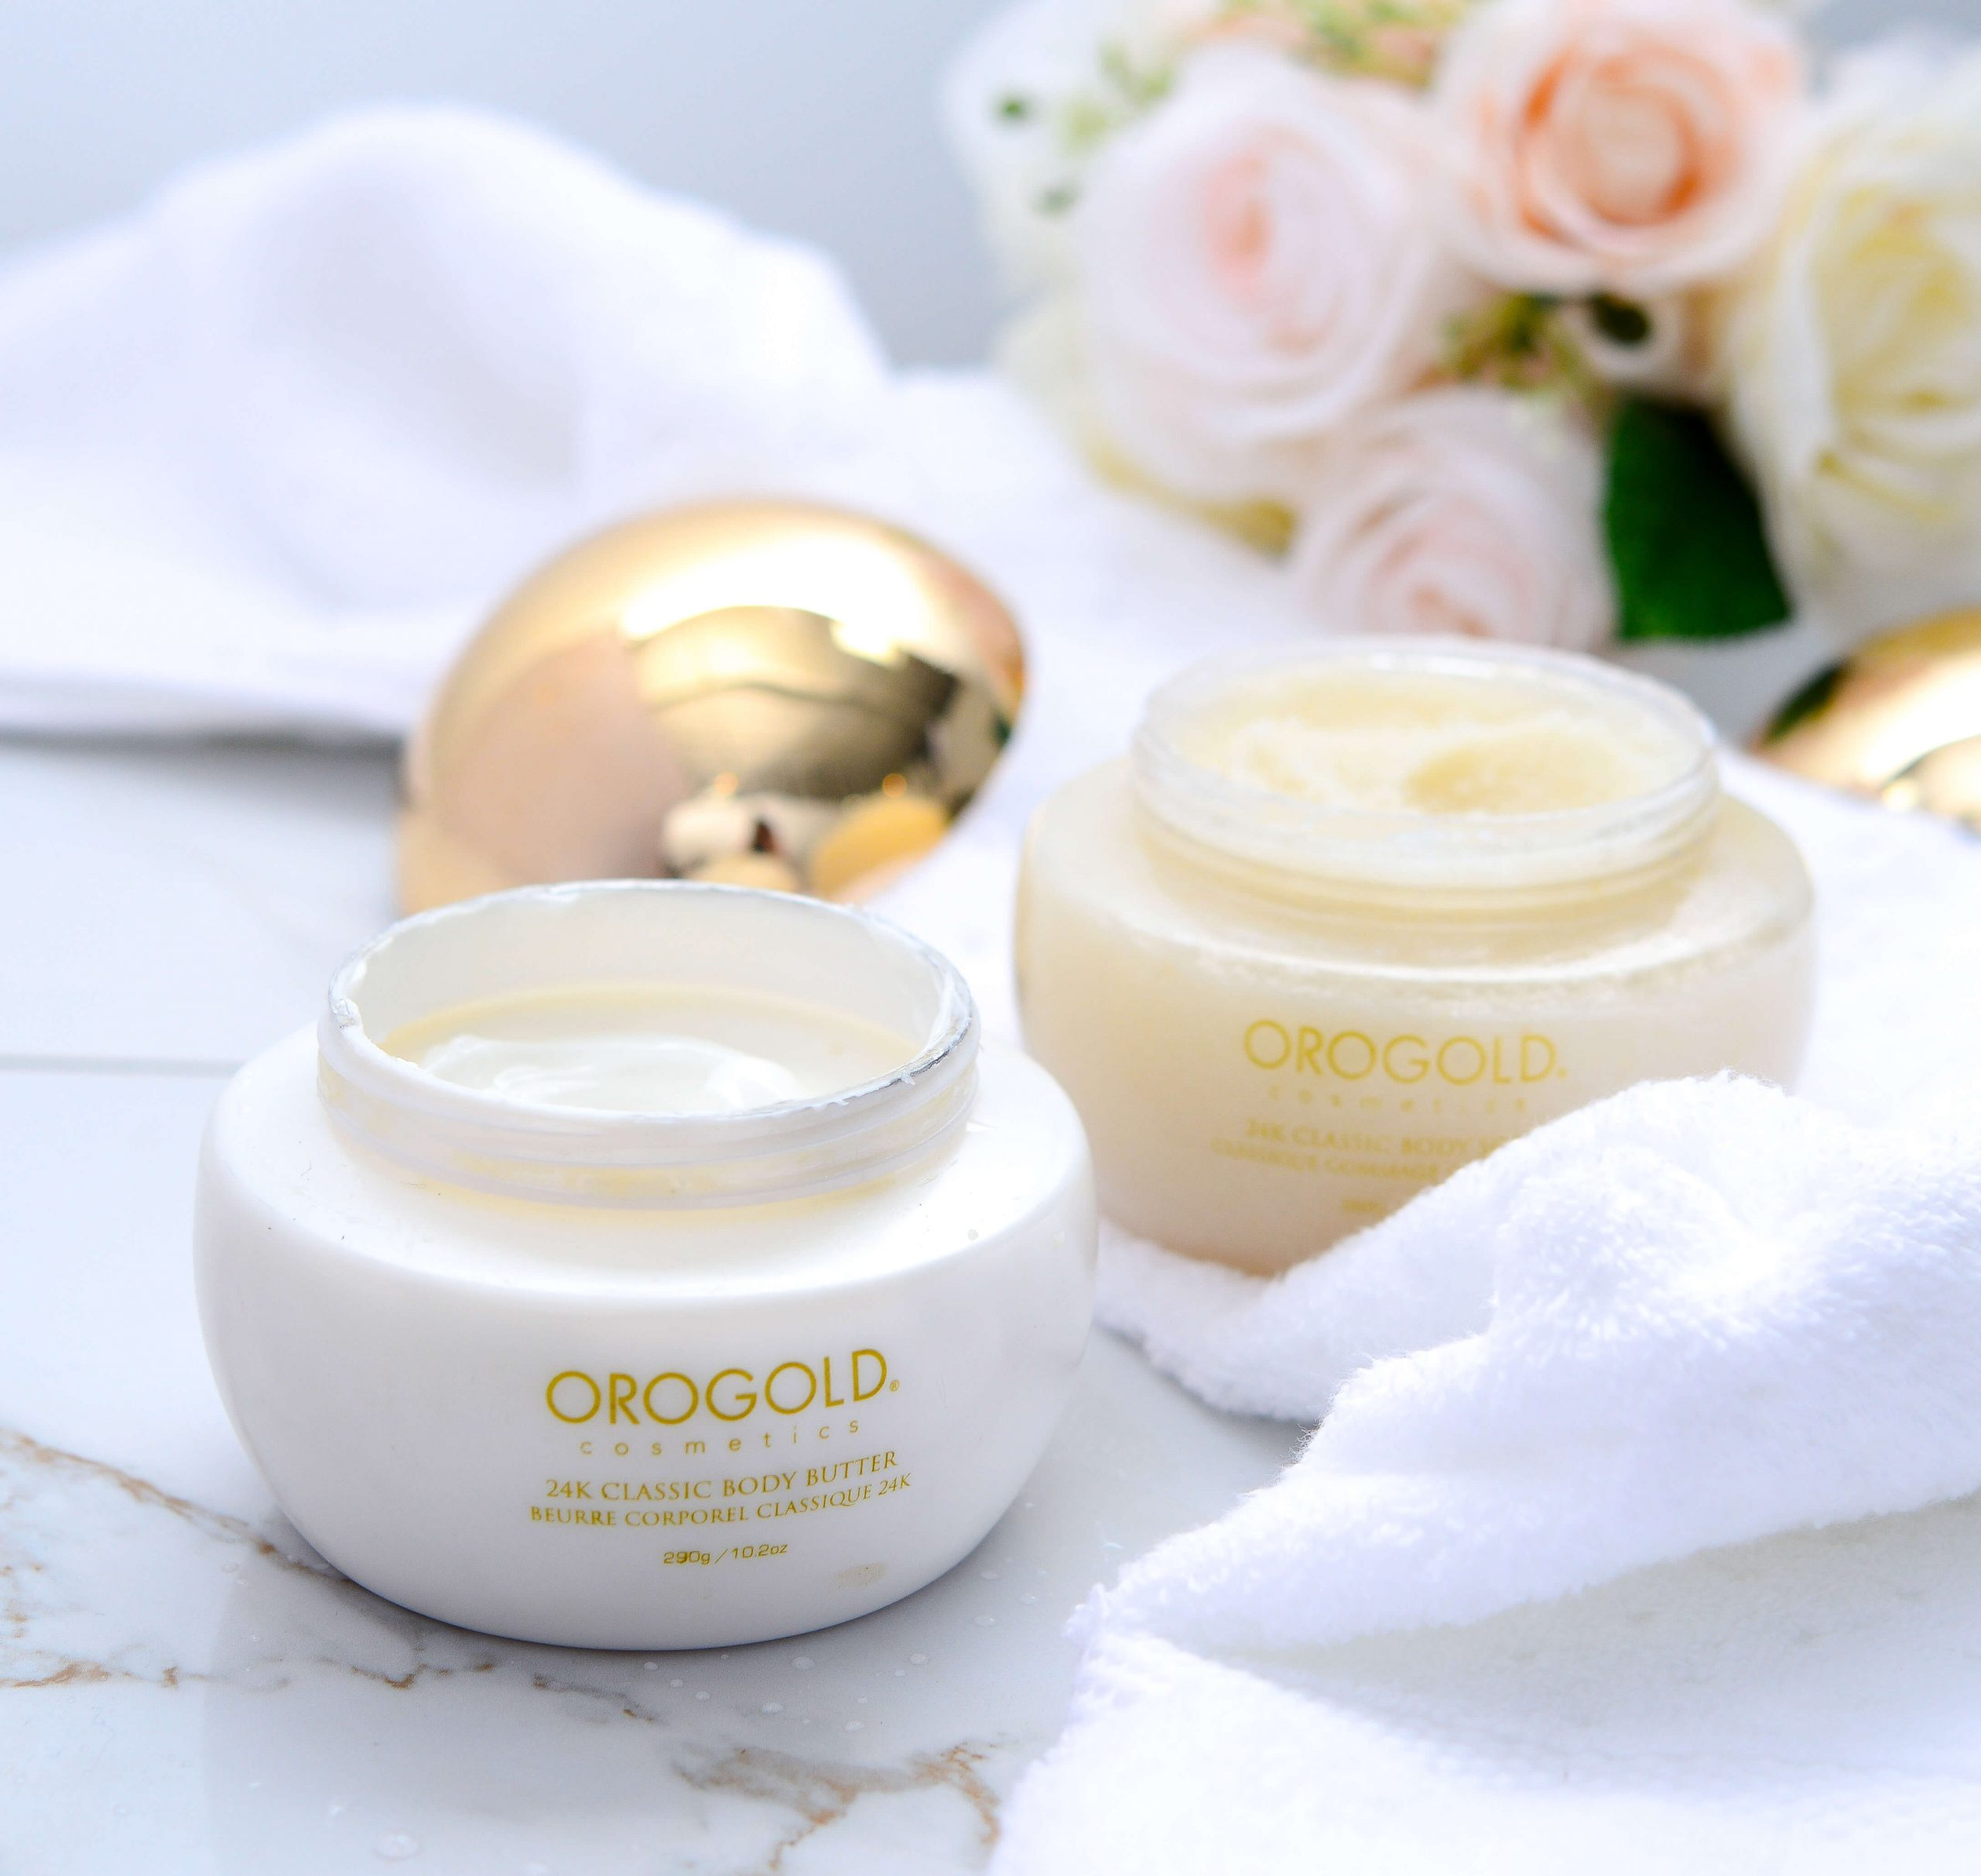 OROGOLD body butter